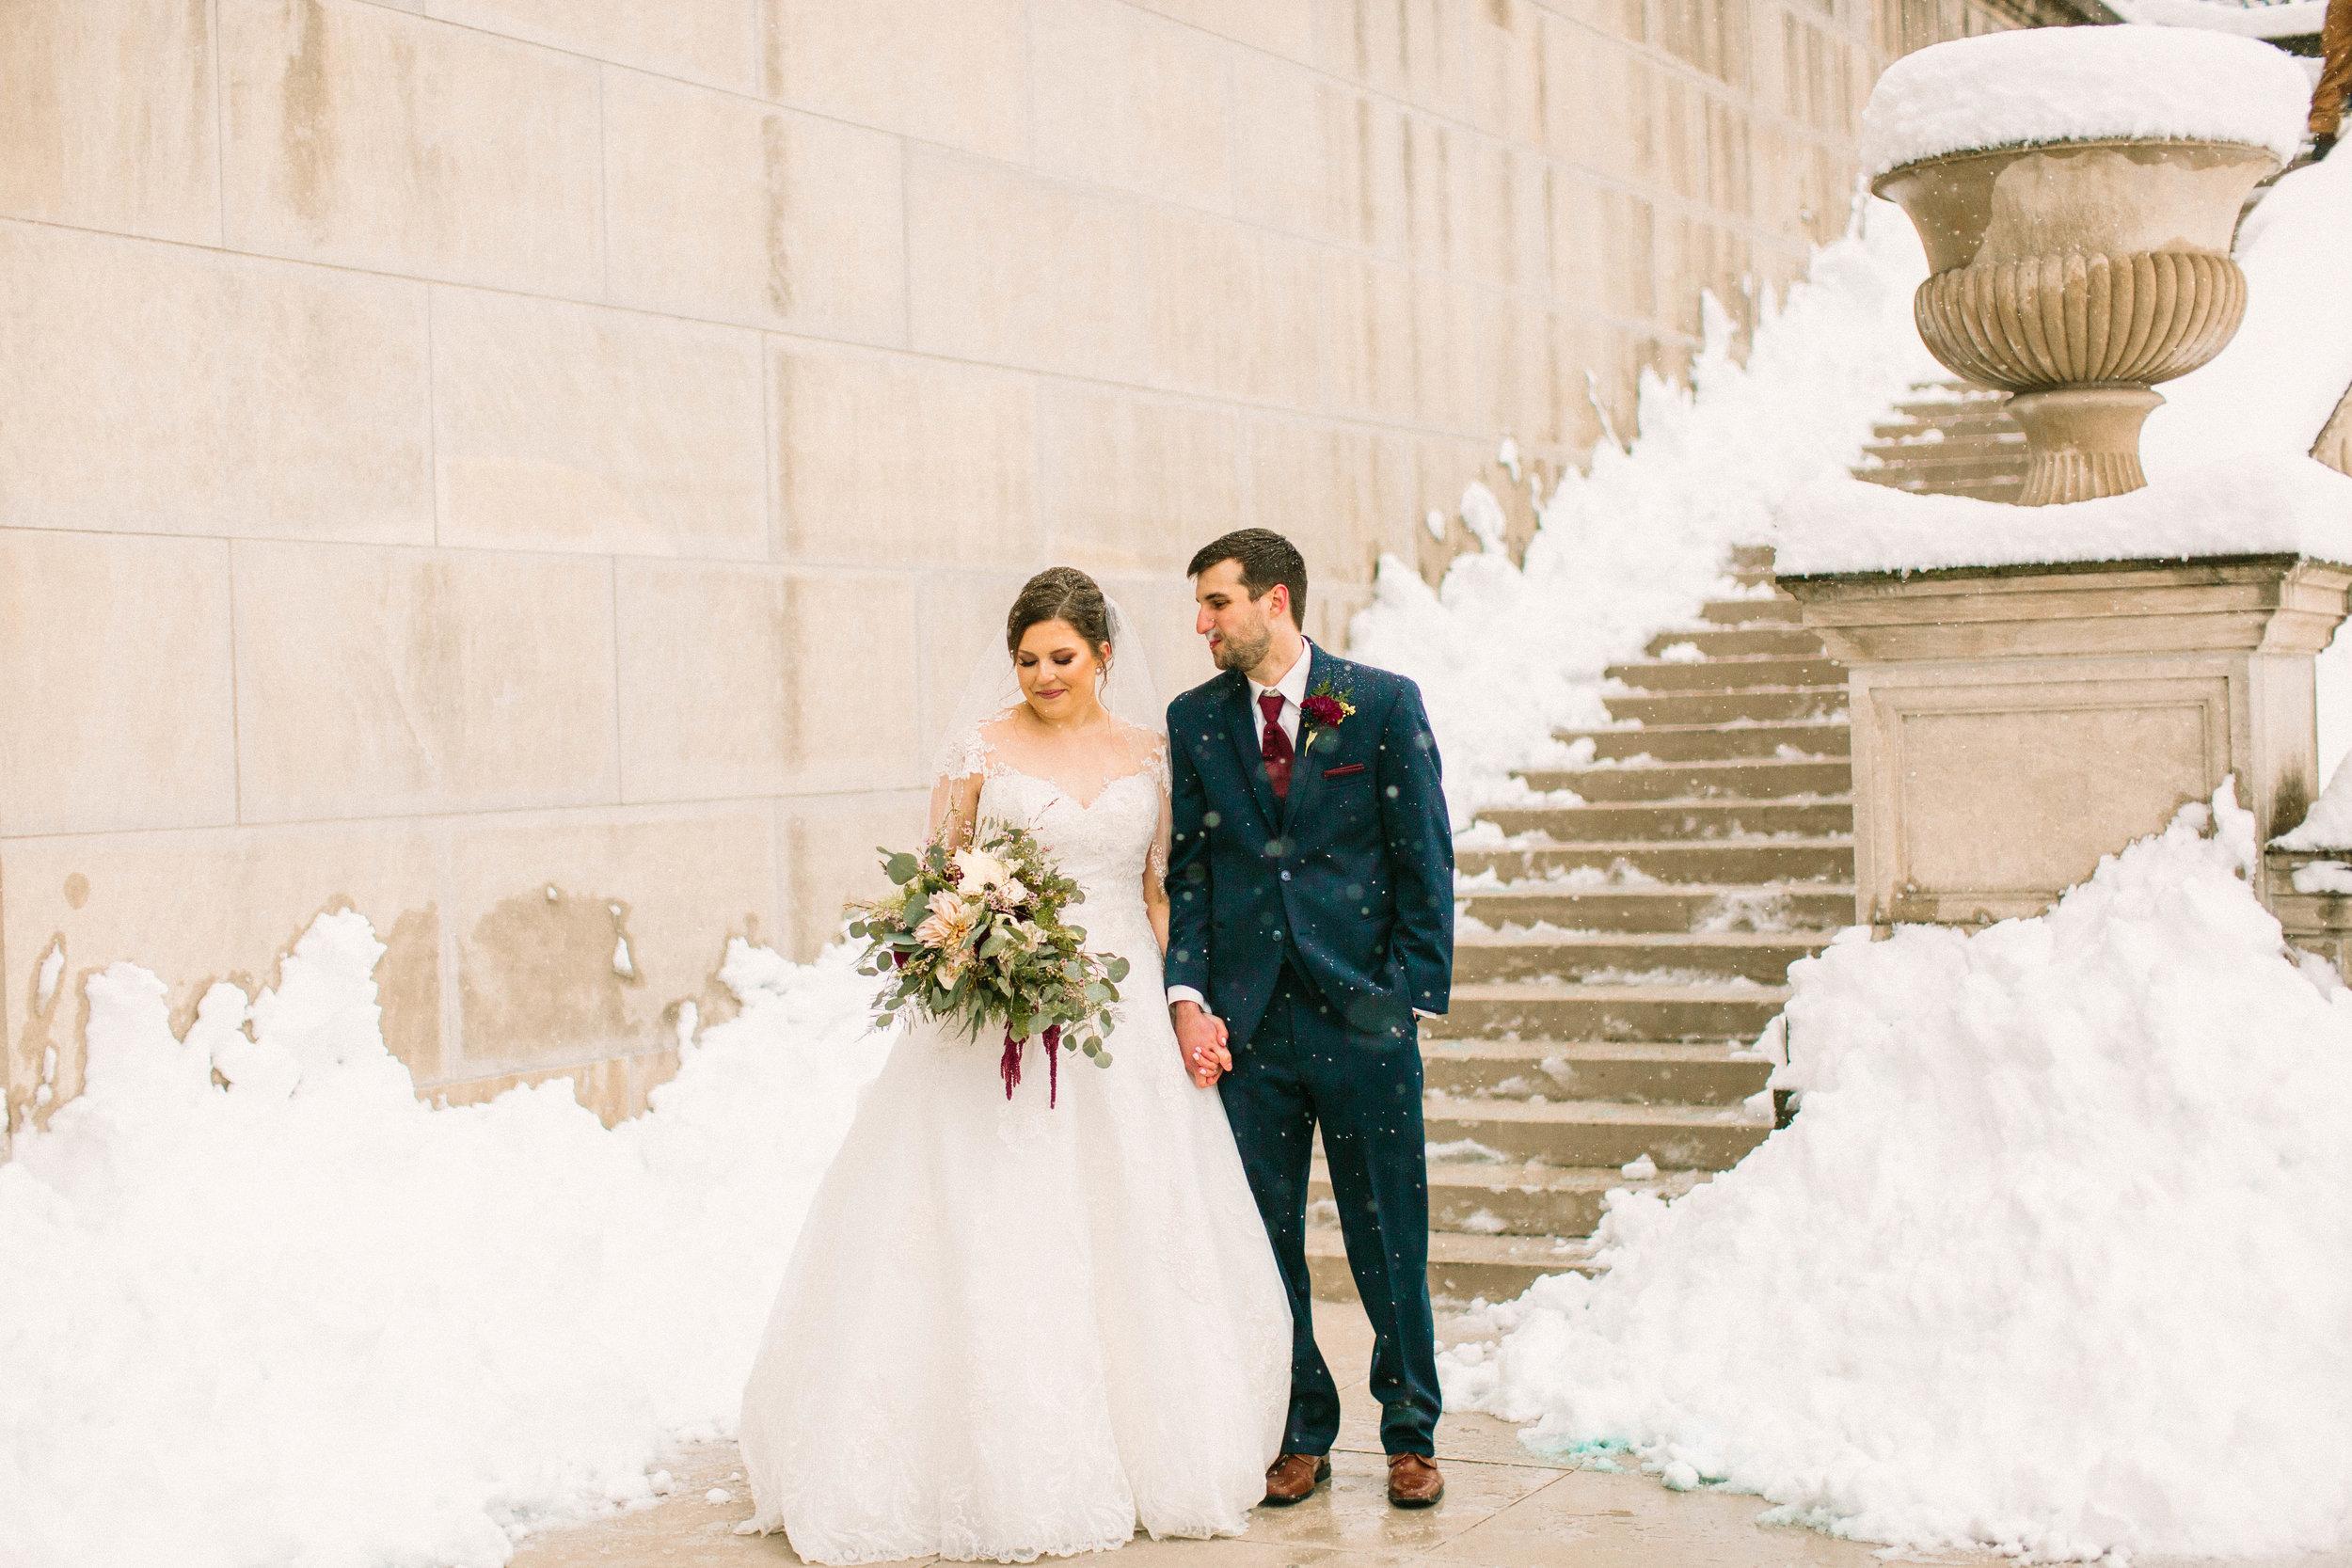 Veronica Young Photography, St. Louis wedding photographer, Jefferson City wedding, Snow wedding